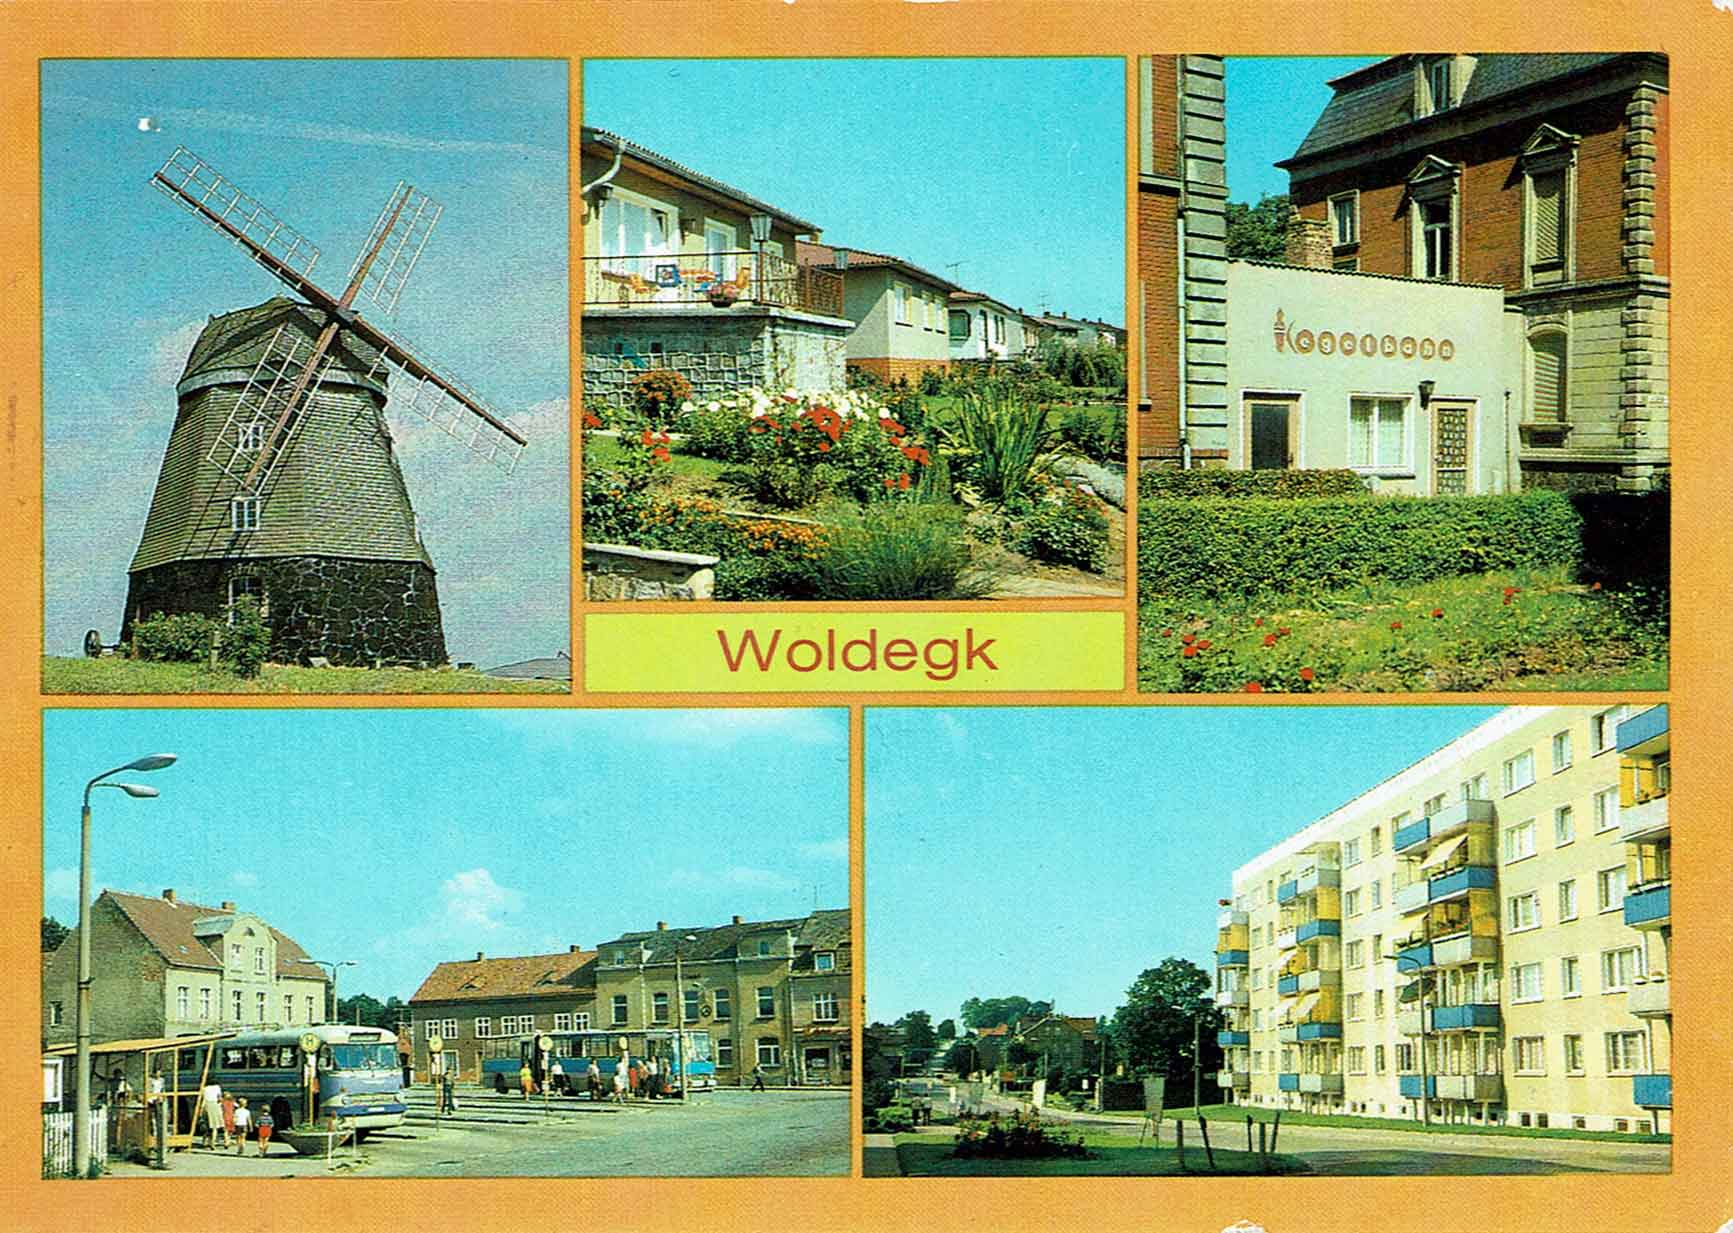 Postkarte Woldegk